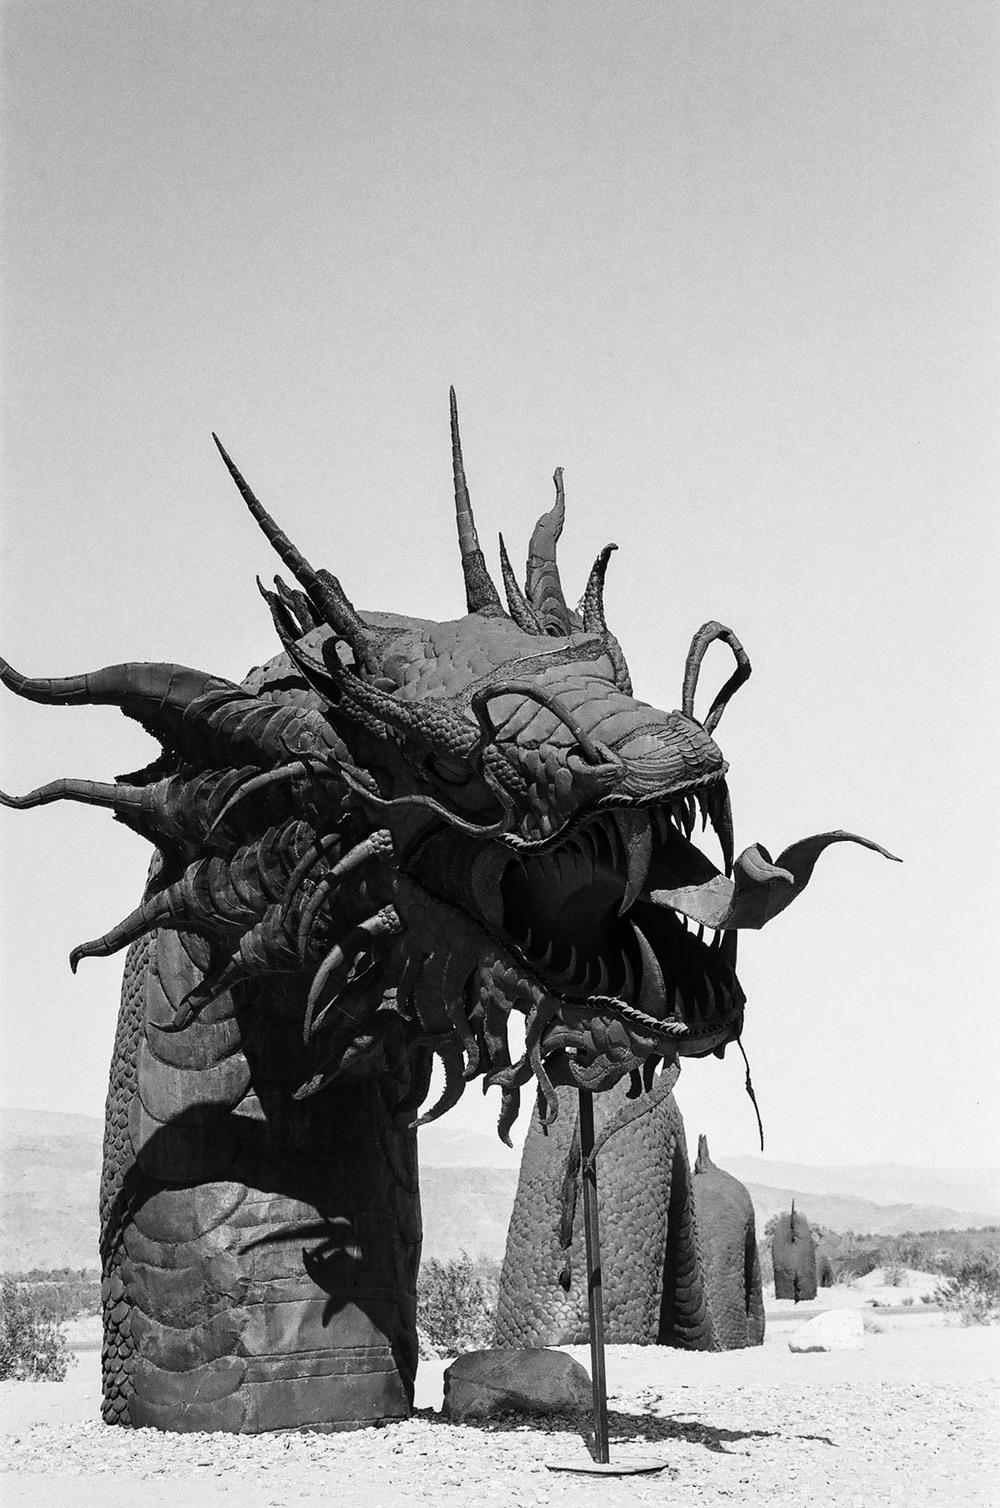 Anza-Borrego-Dragon-03.jpg